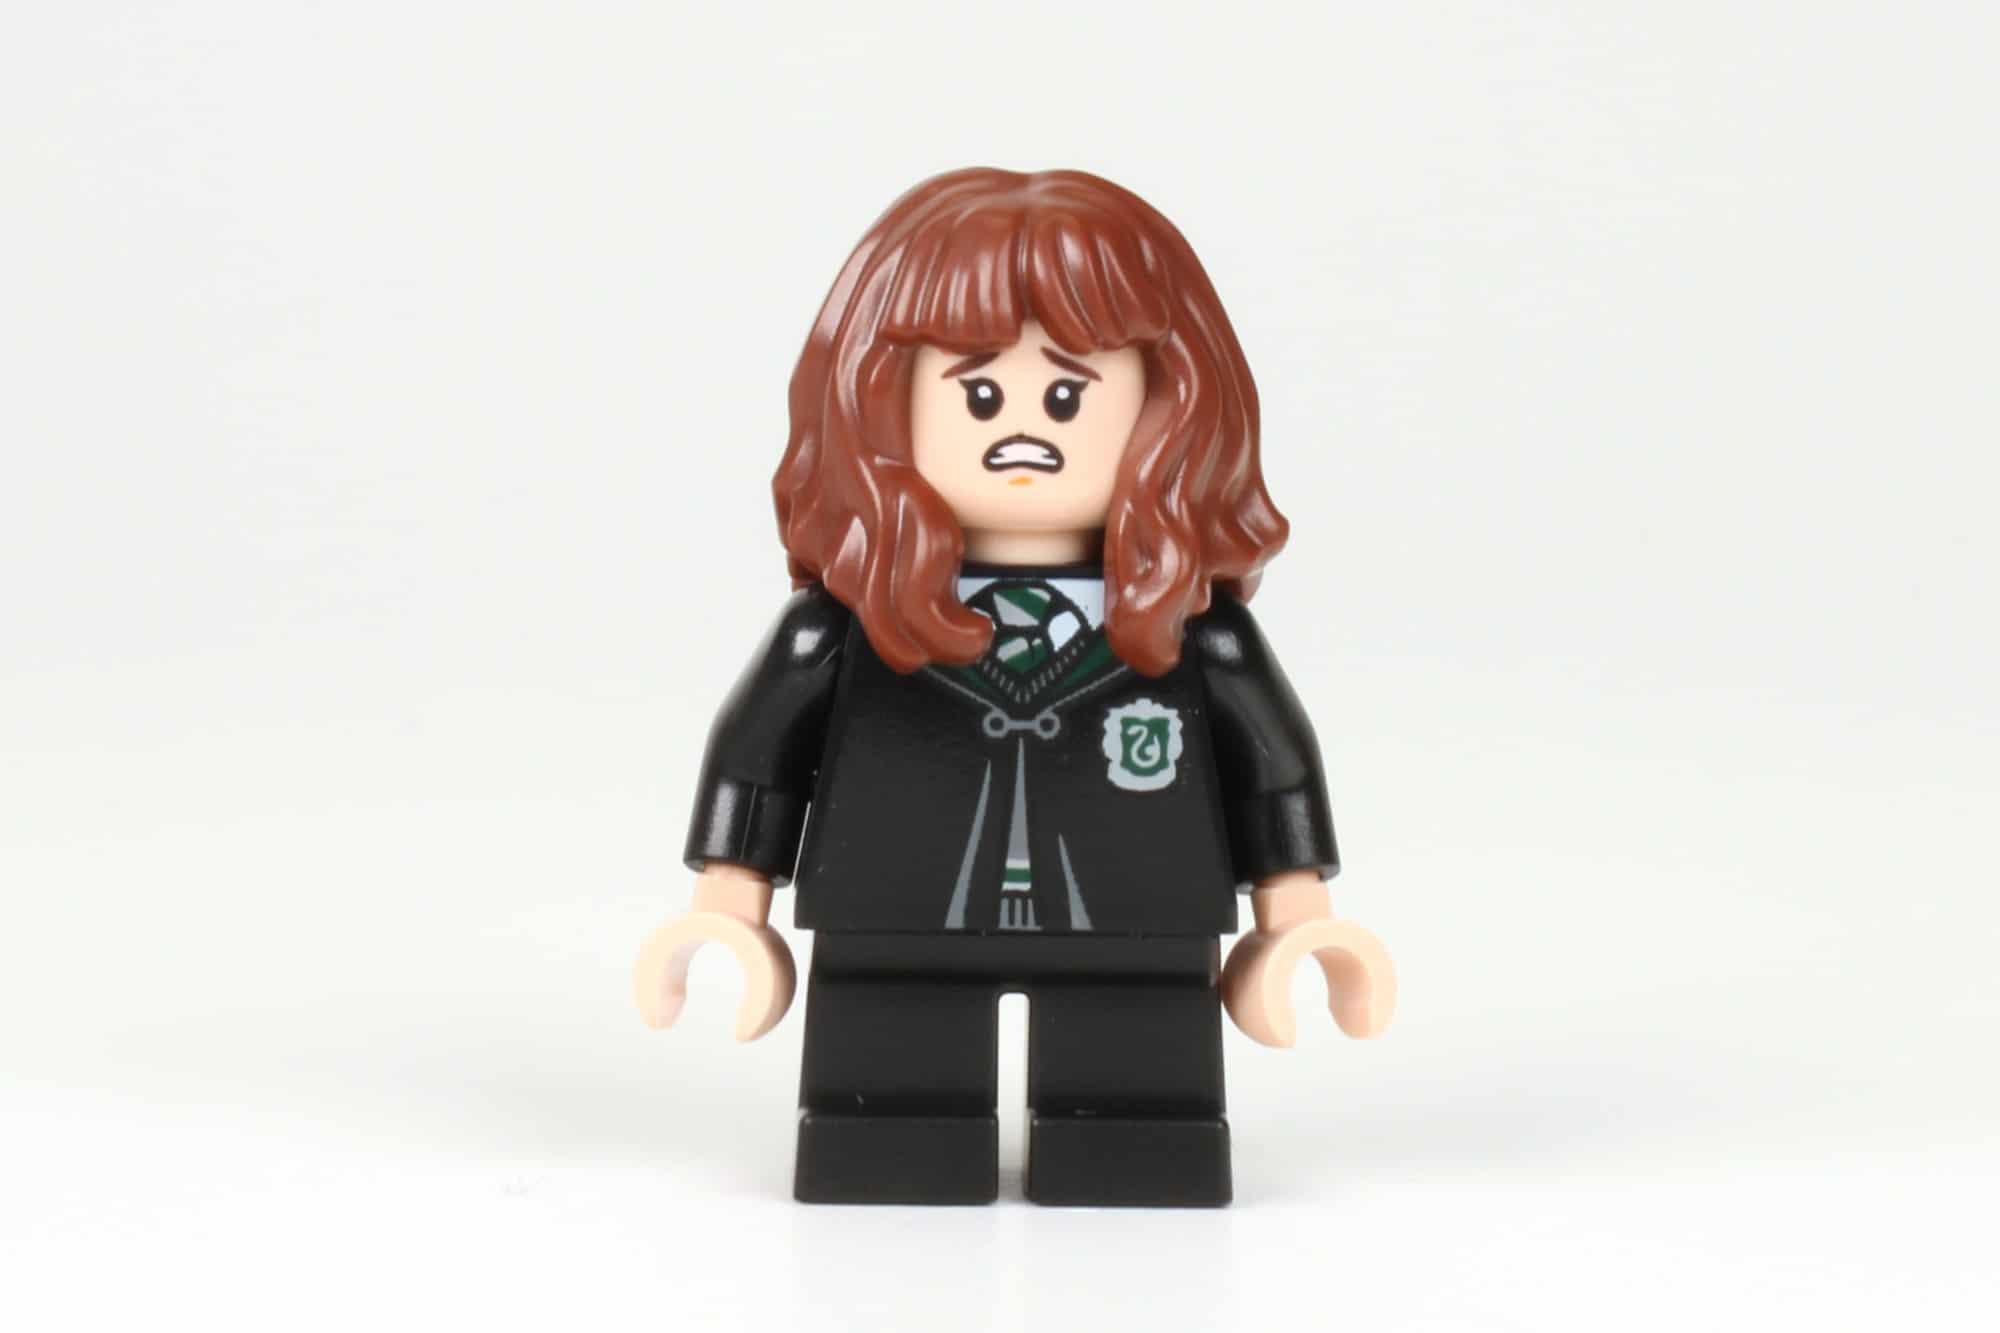 LEGO Harry Potter 76386 Hogwarts Misslungener Vielsafttrank Minifiguren 1 1